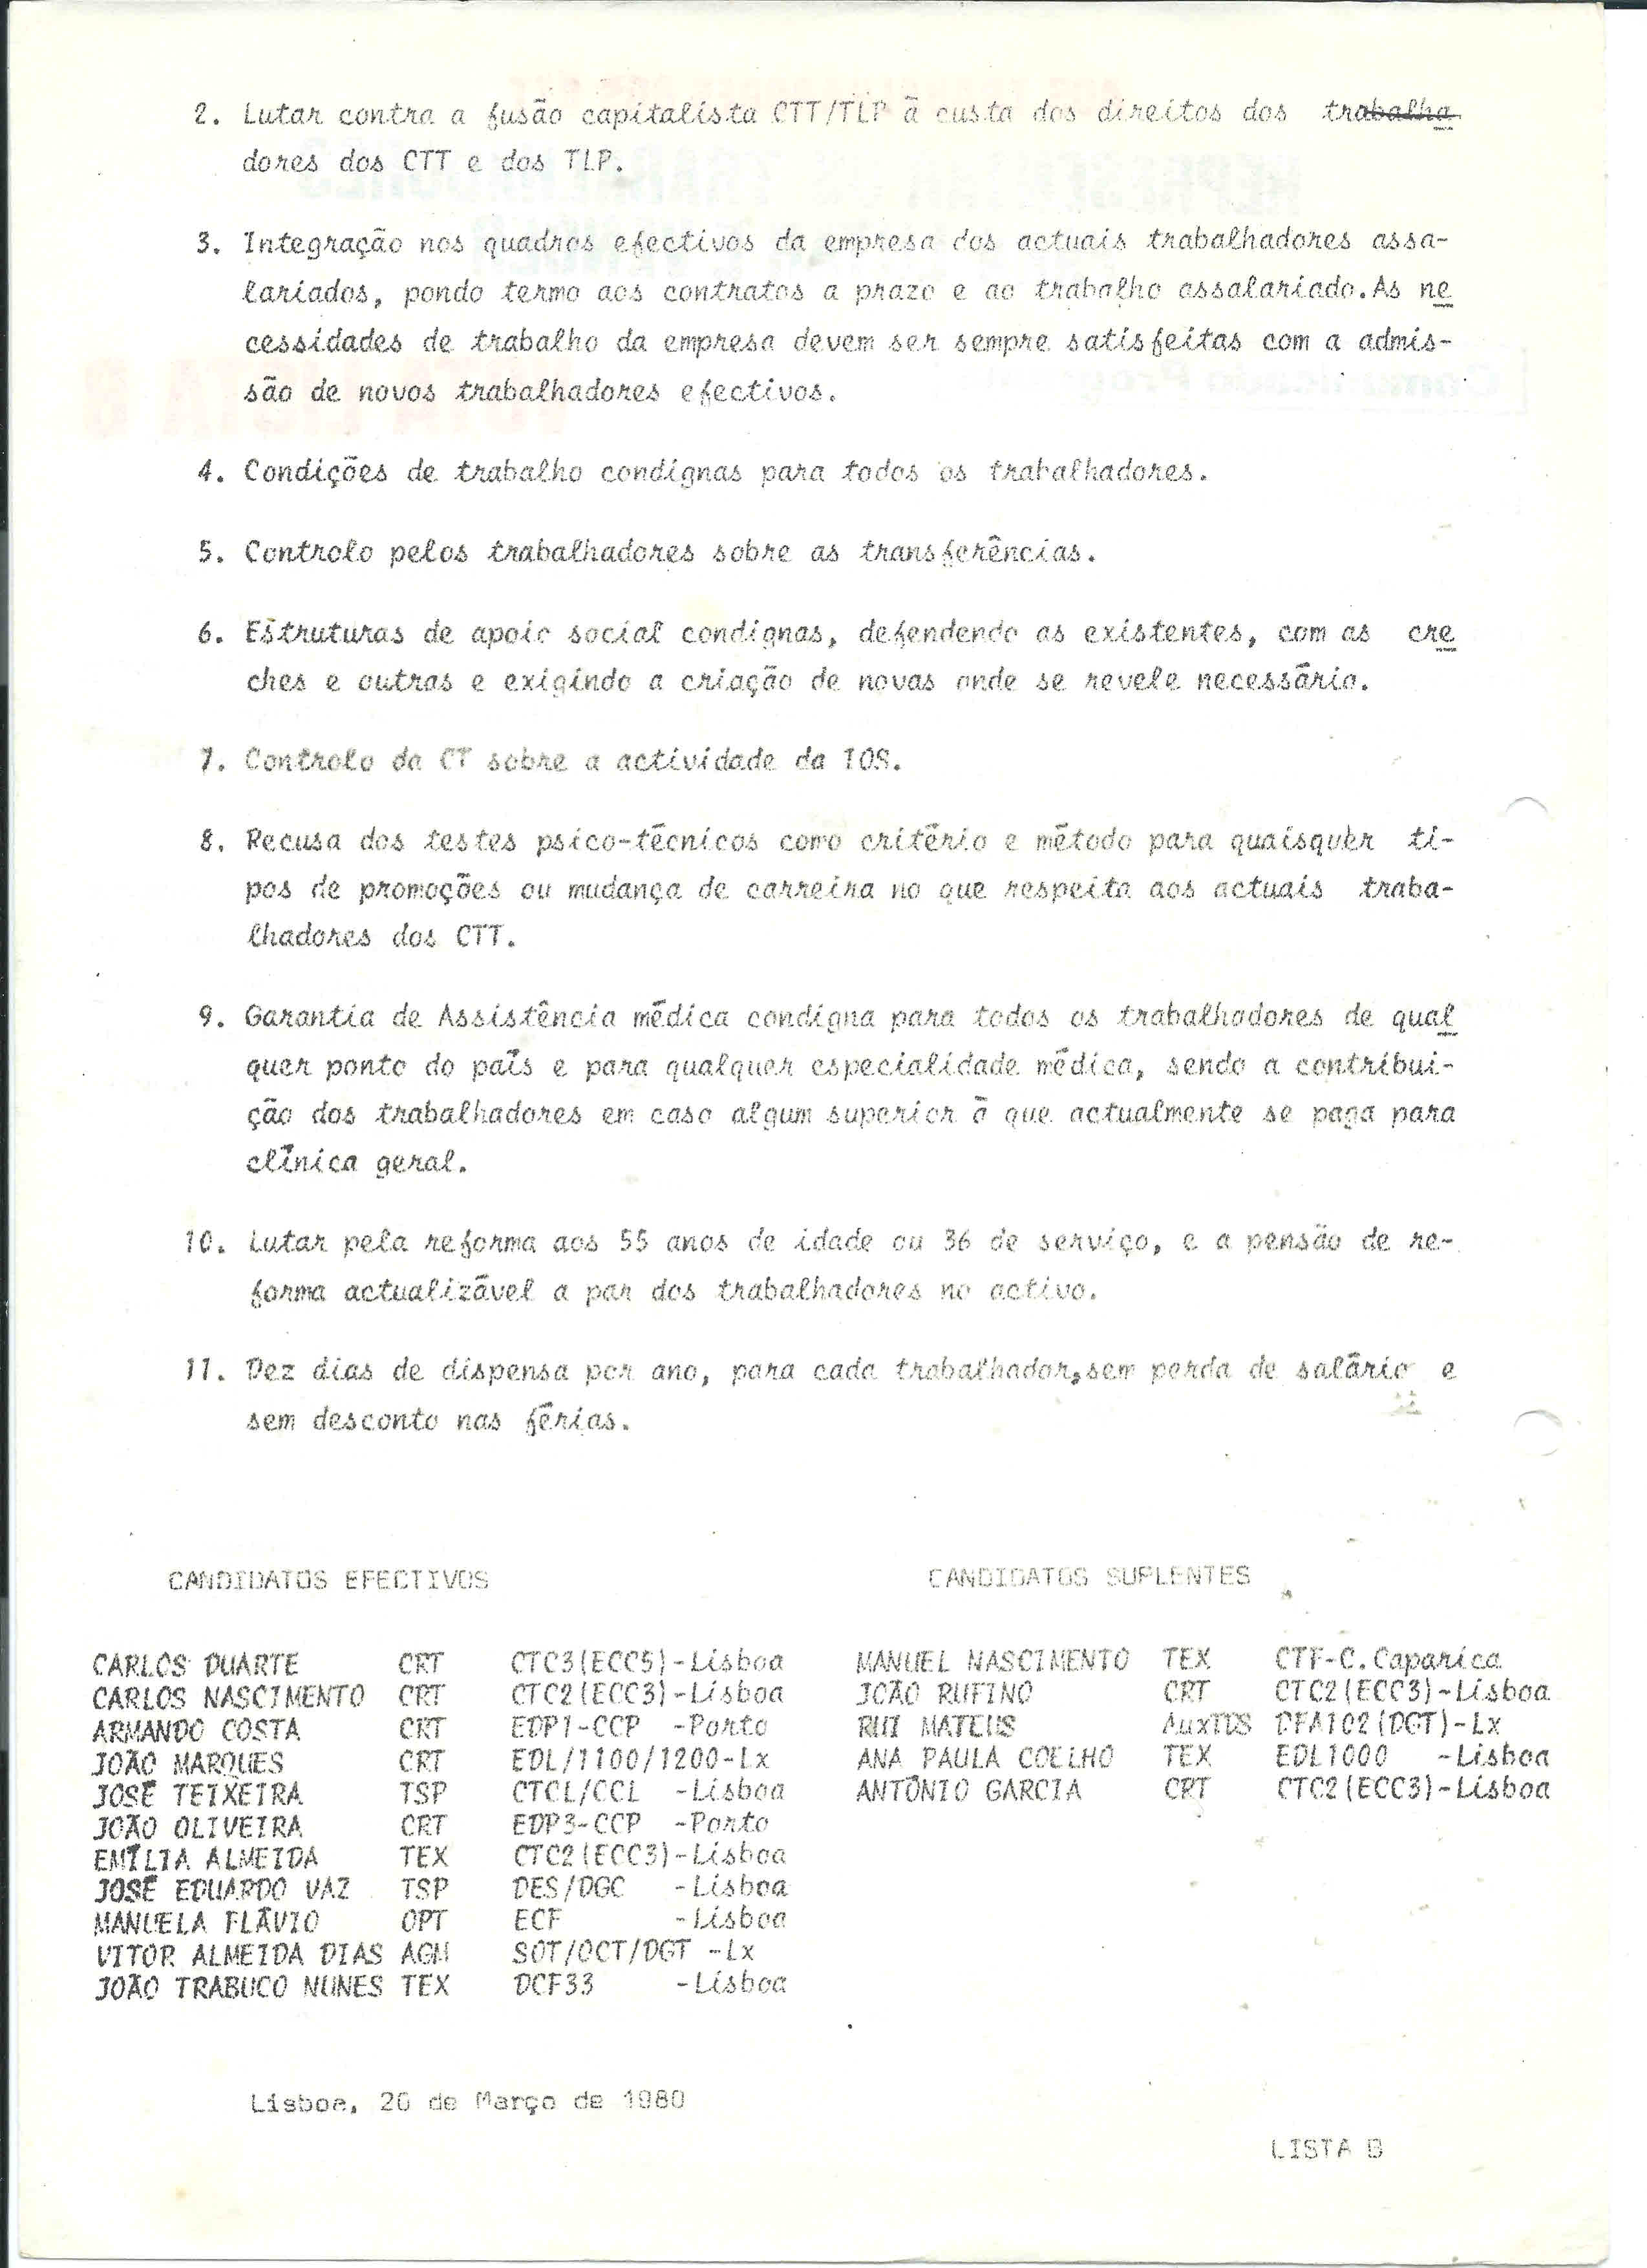 Copy of trab dos CTT lista B